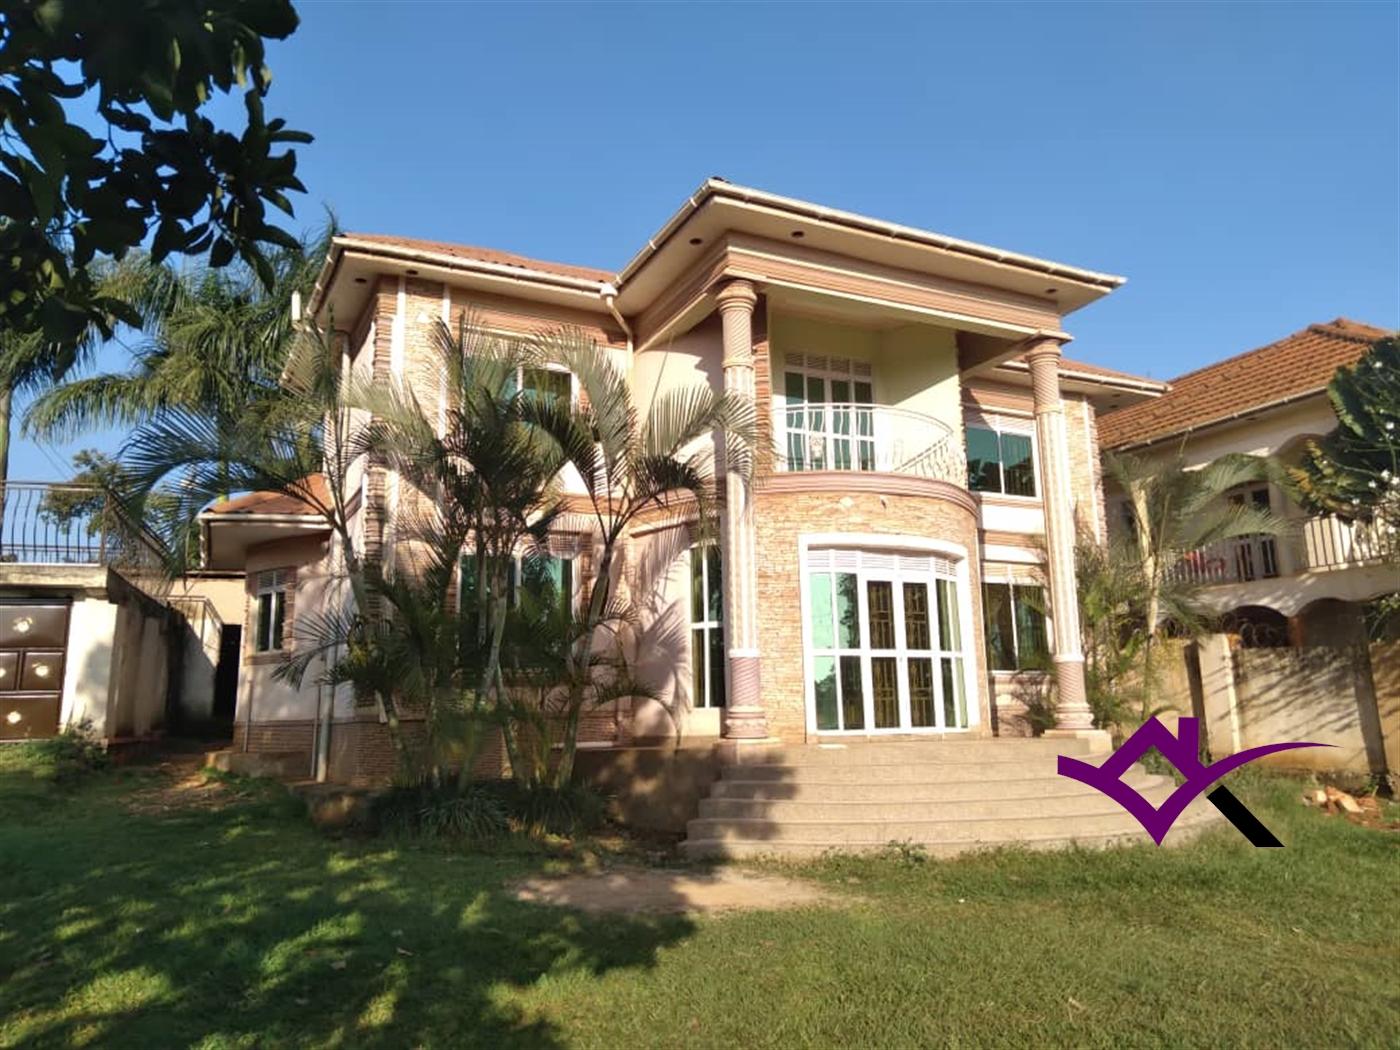 Storeyed house for sale in Kitala Wakiso